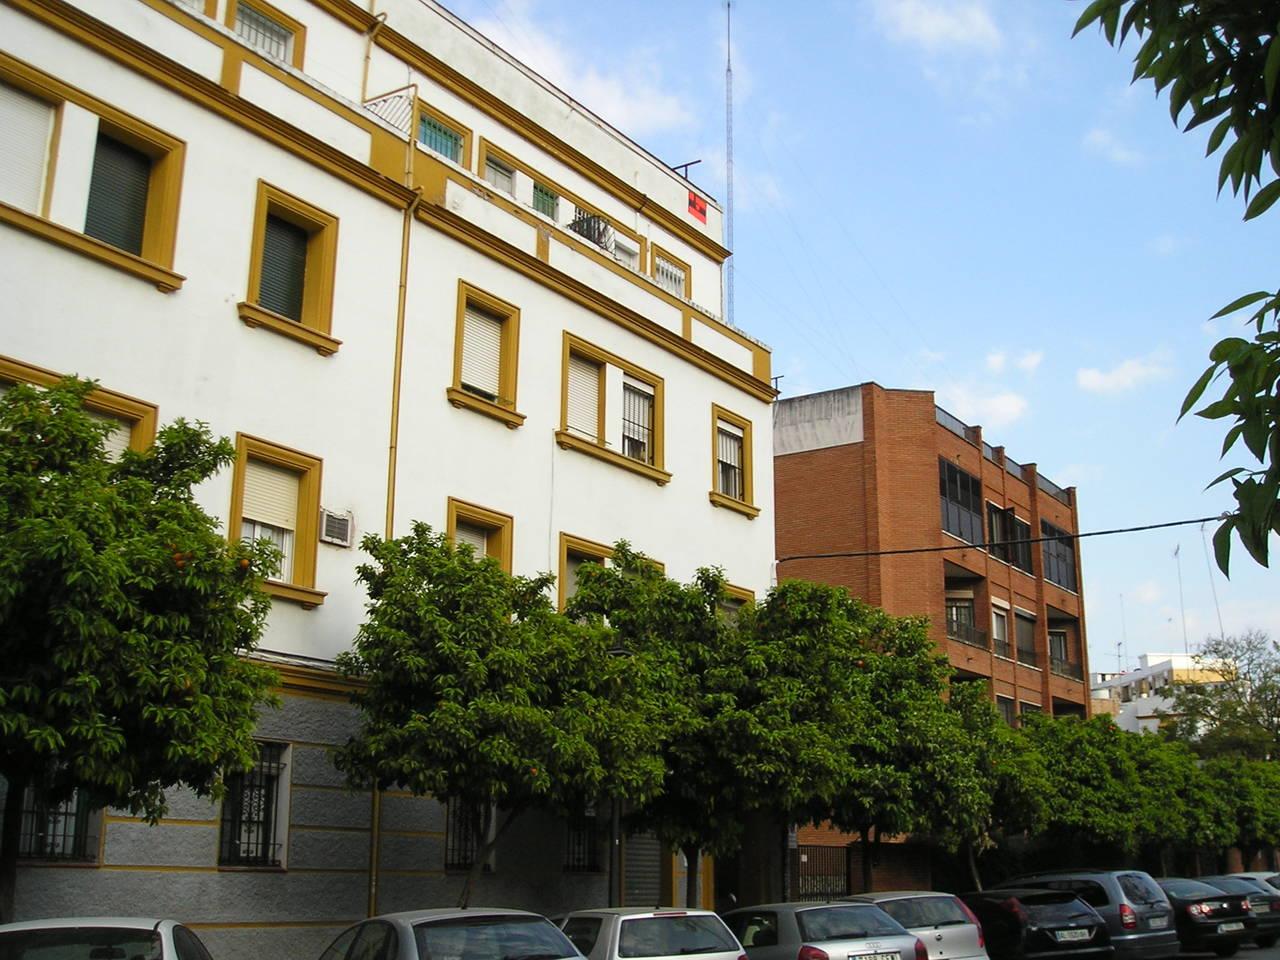 alquiler apartamento. Calle San Juan de Dios 17, 3º d. Sevilla  - Foto 10